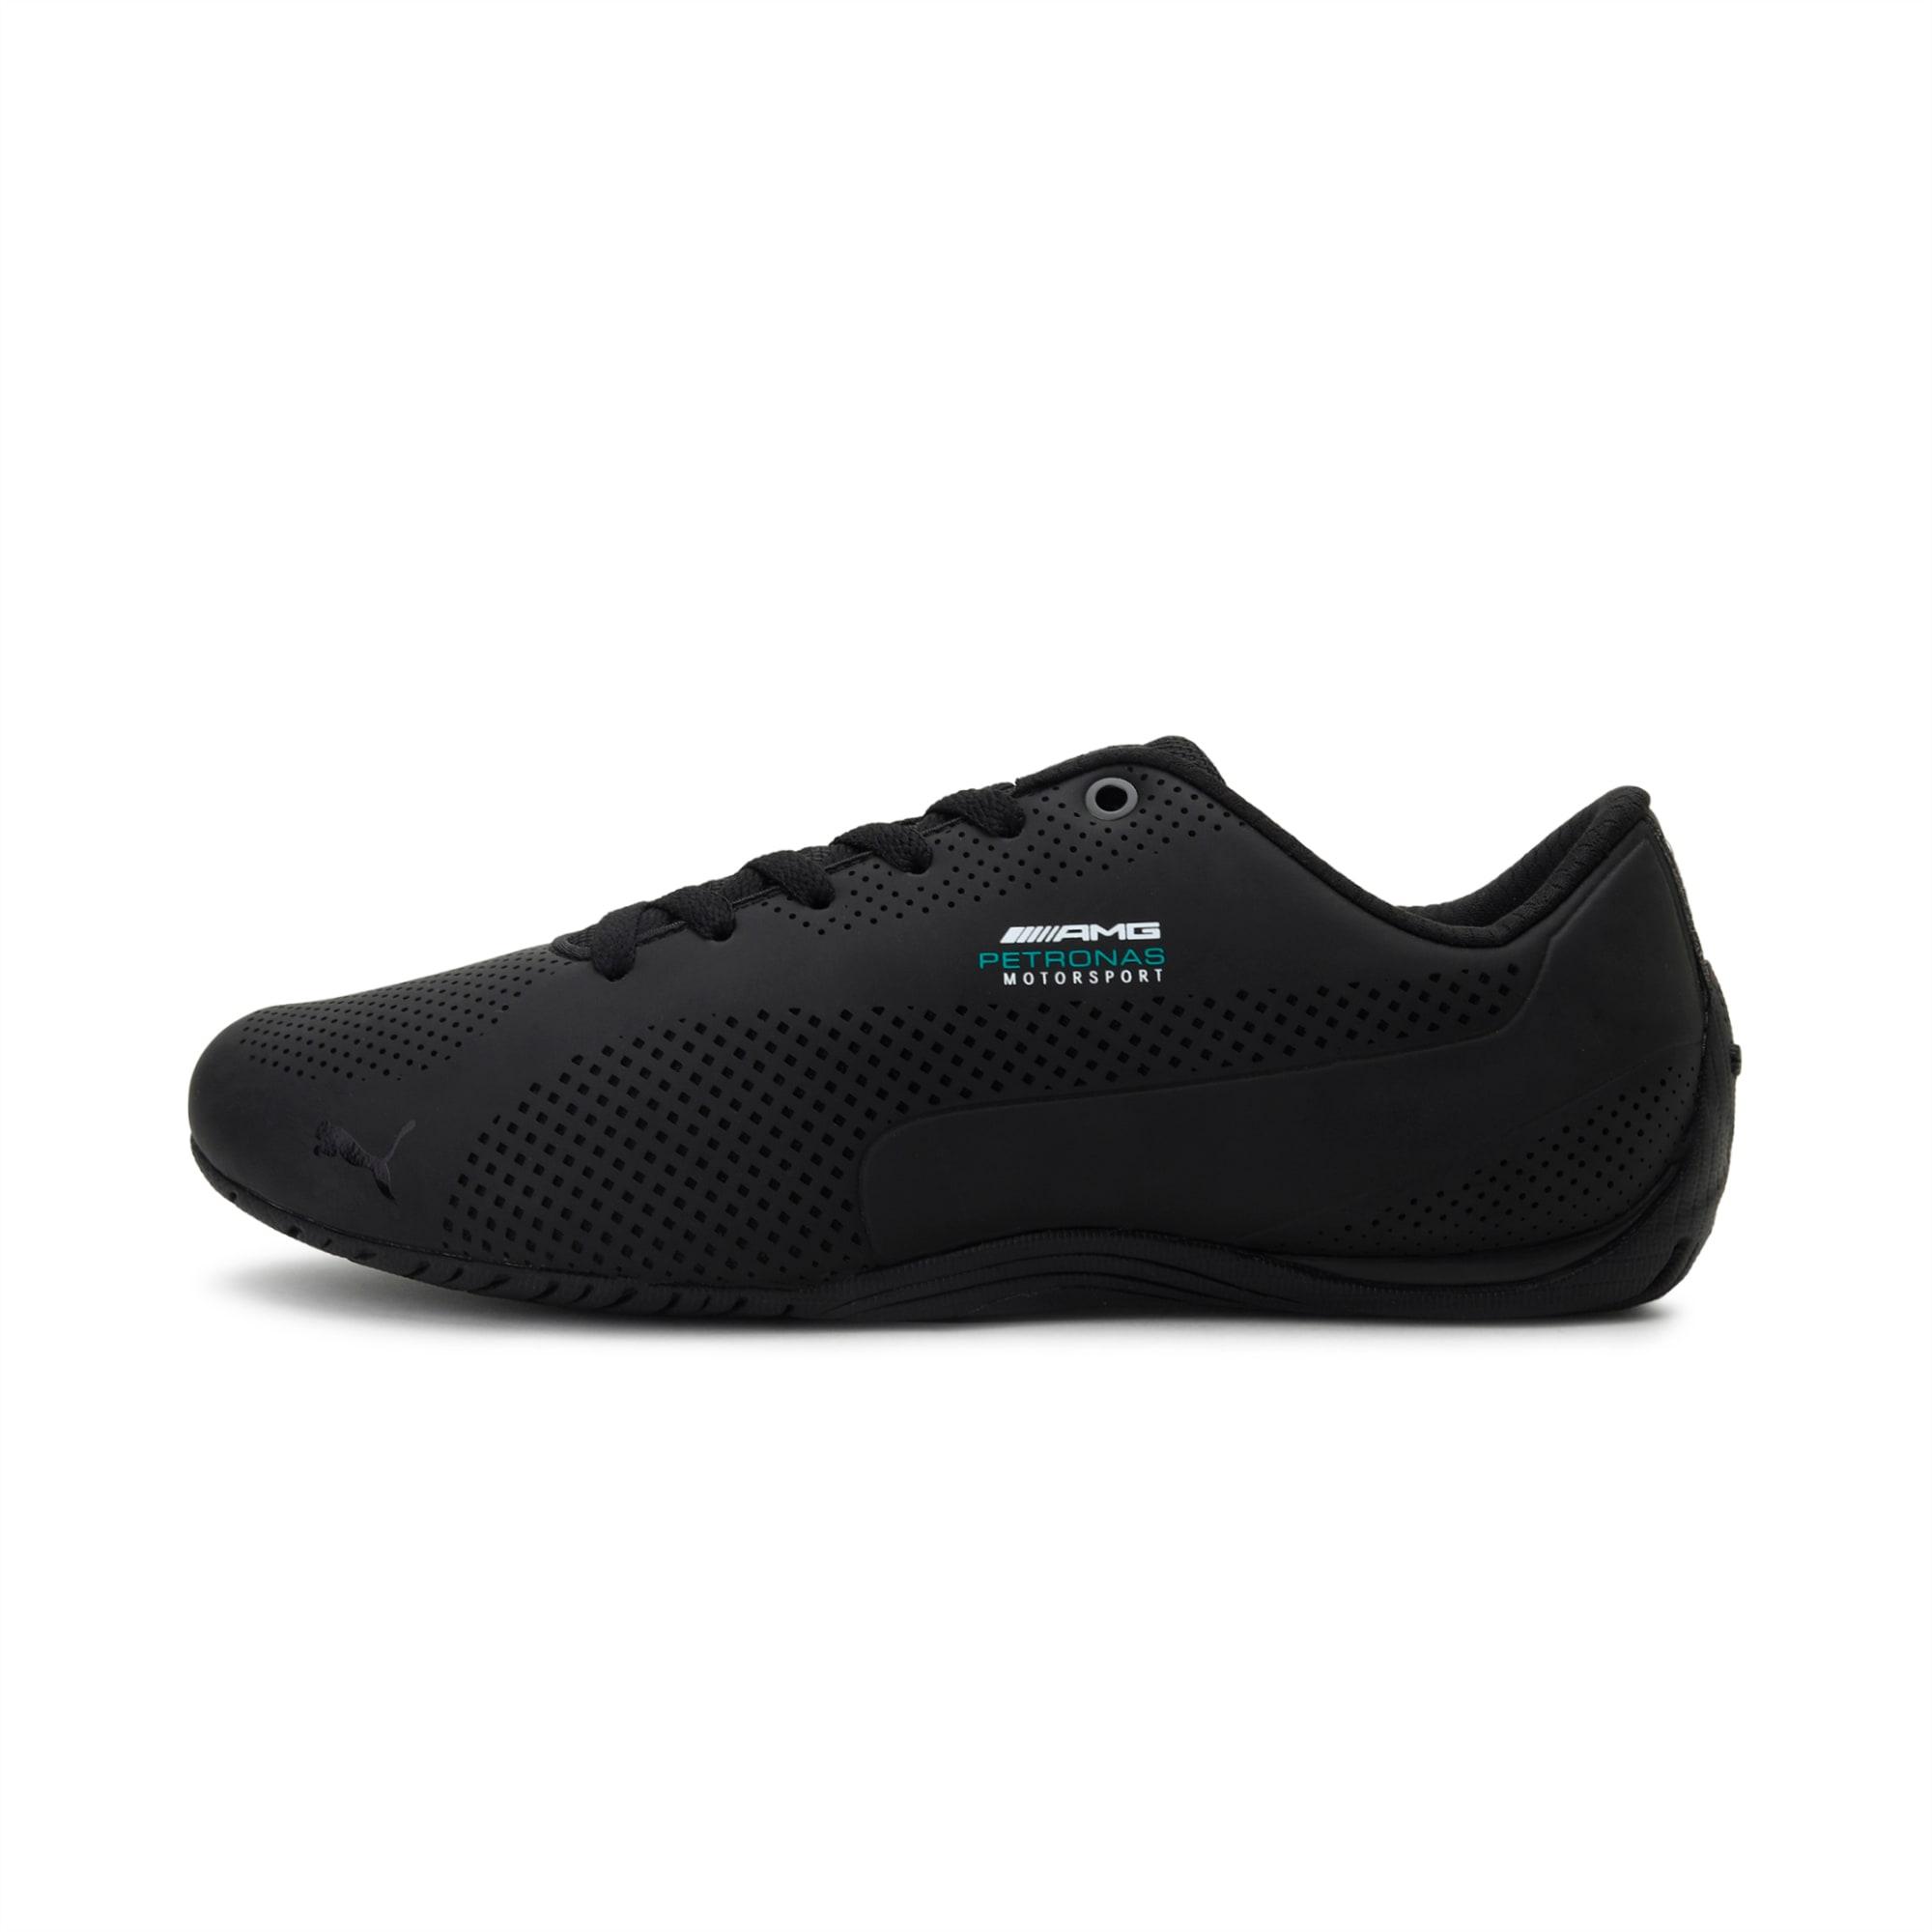 puma mercedes shoes price in india